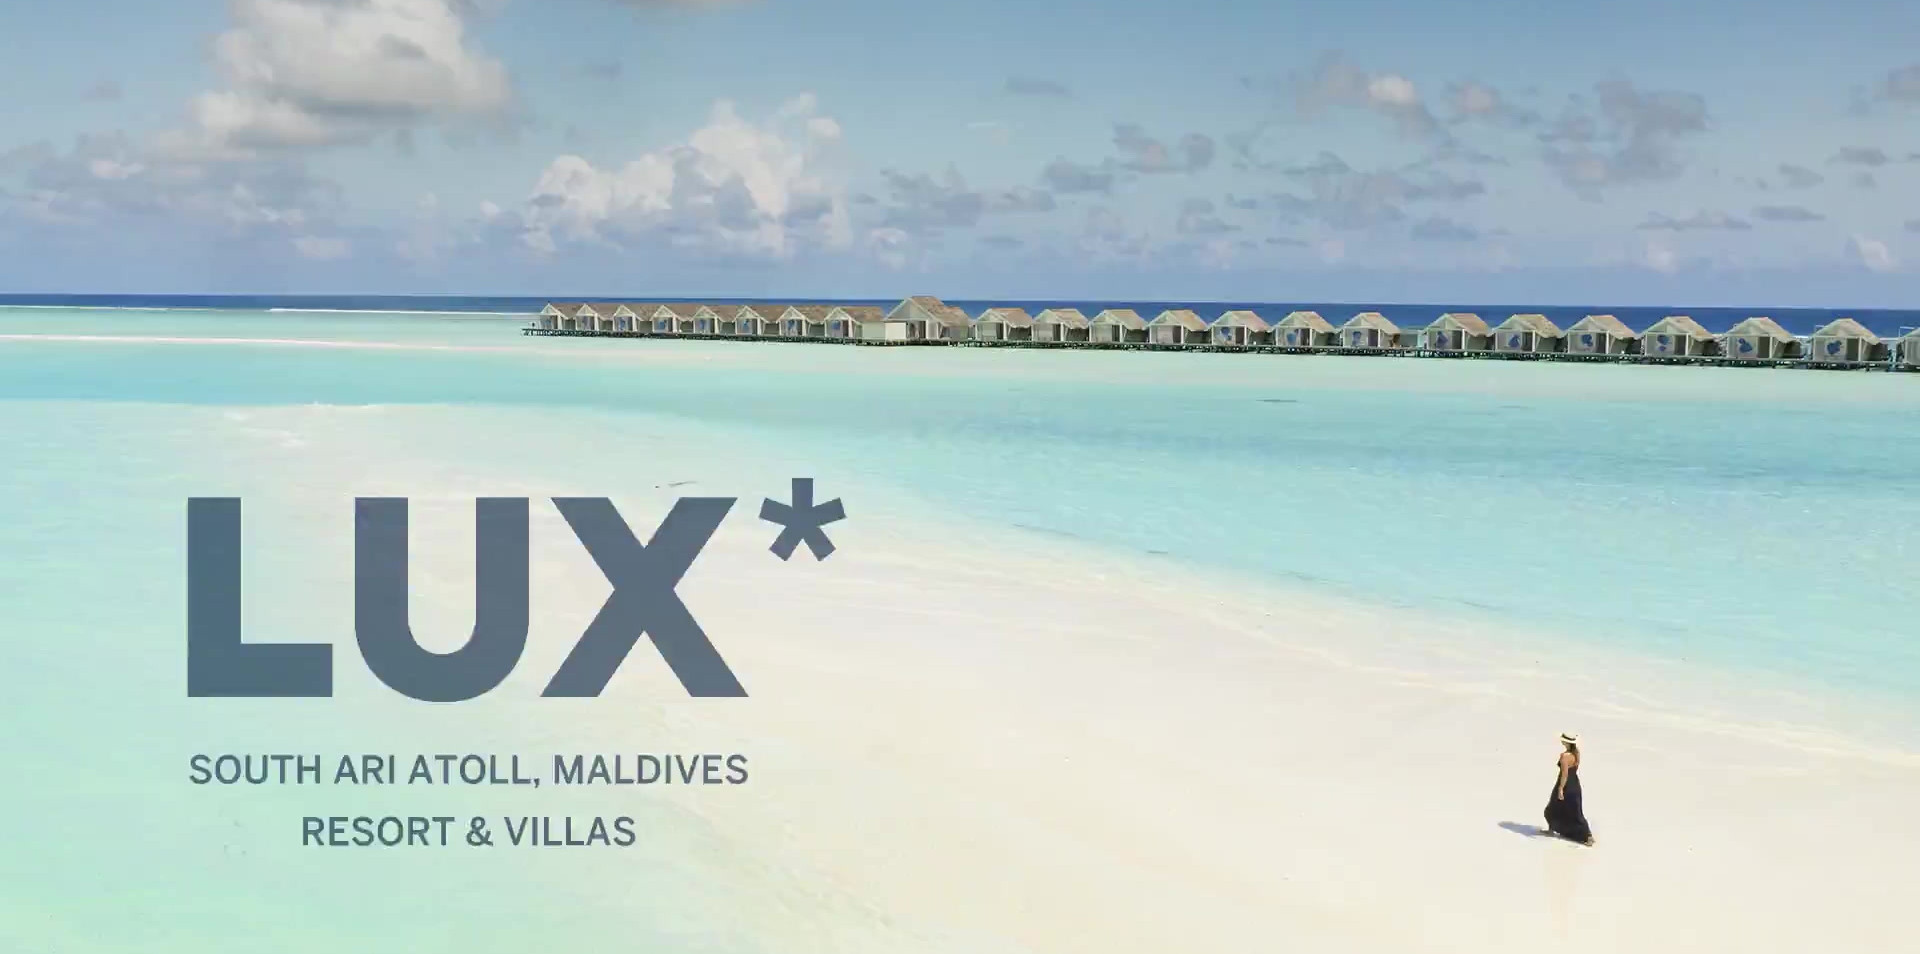 Descubra o Lux* South Ari Atoll